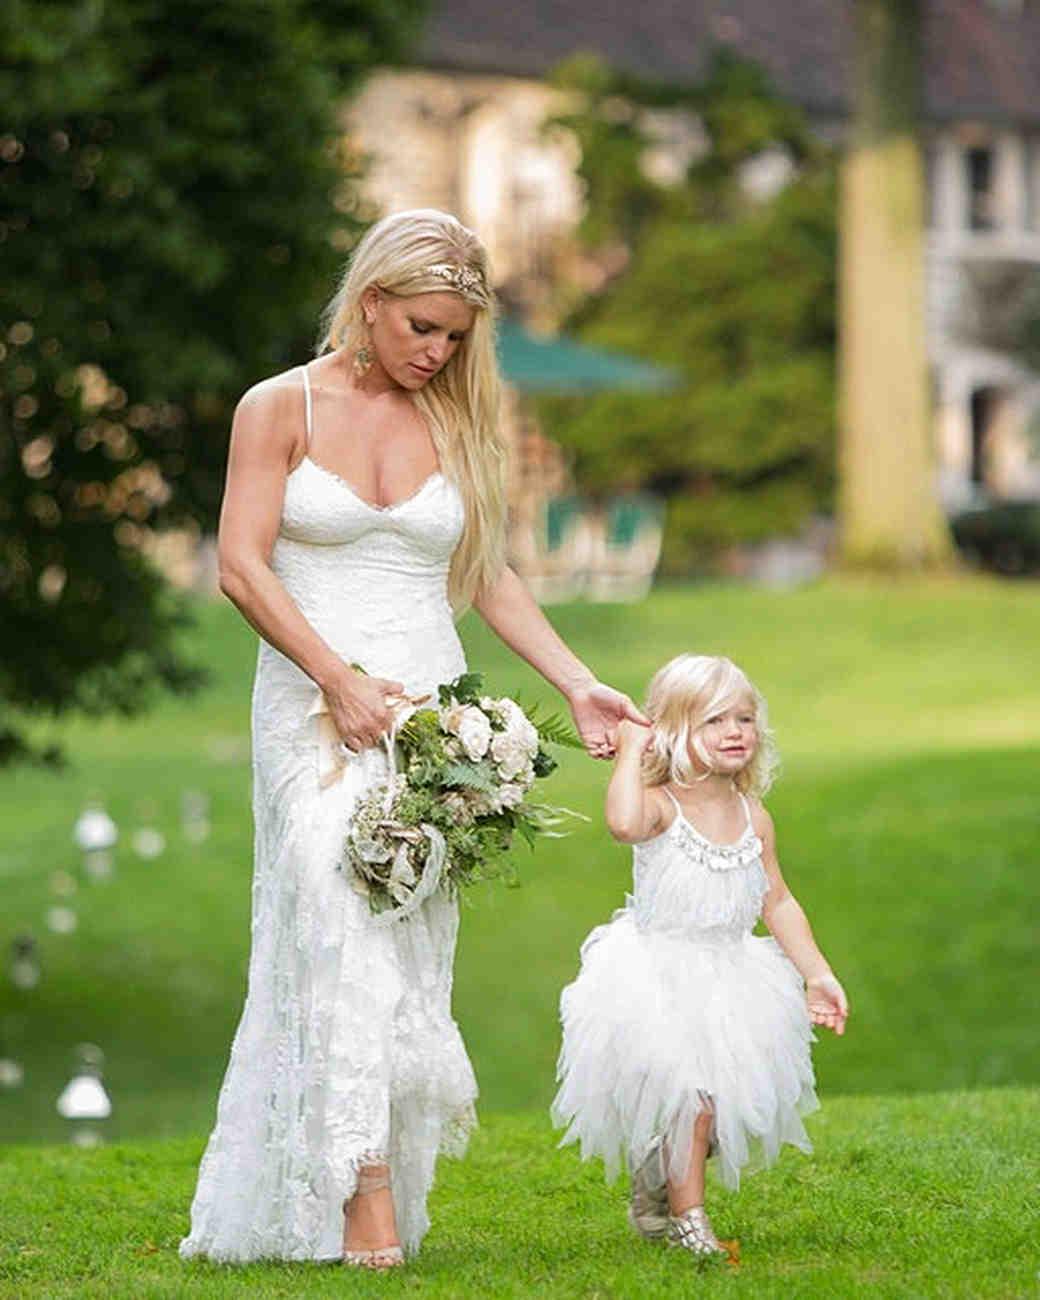 maxwell-drew-johnson-jessica-simpson-kids-weddings-0716.jpg